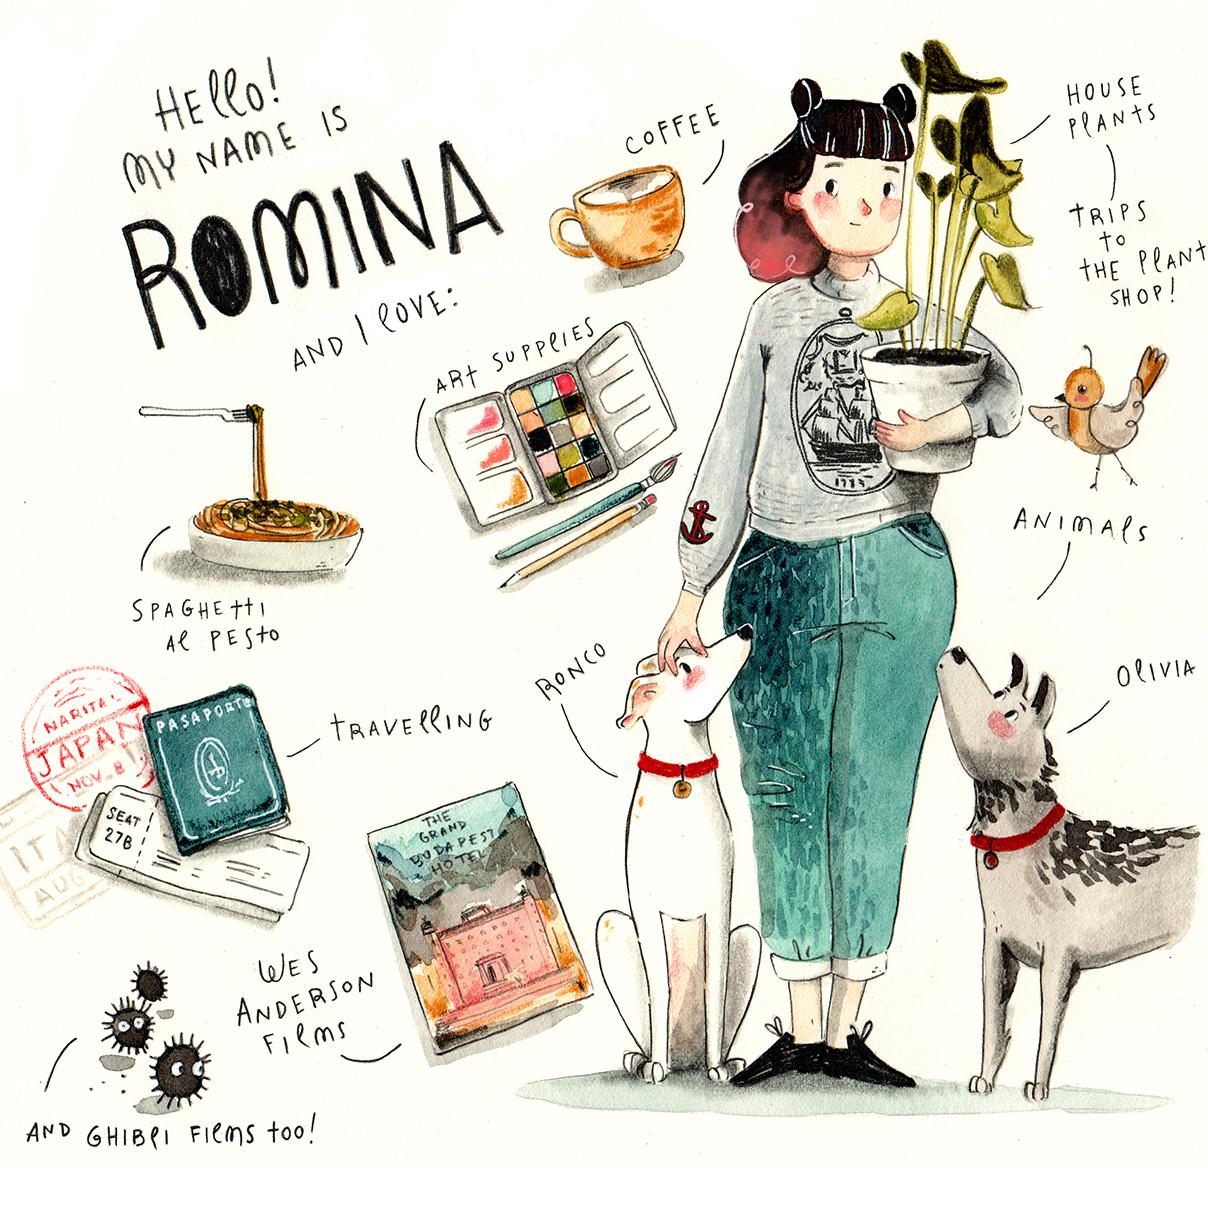 Romina_MTA.JPG